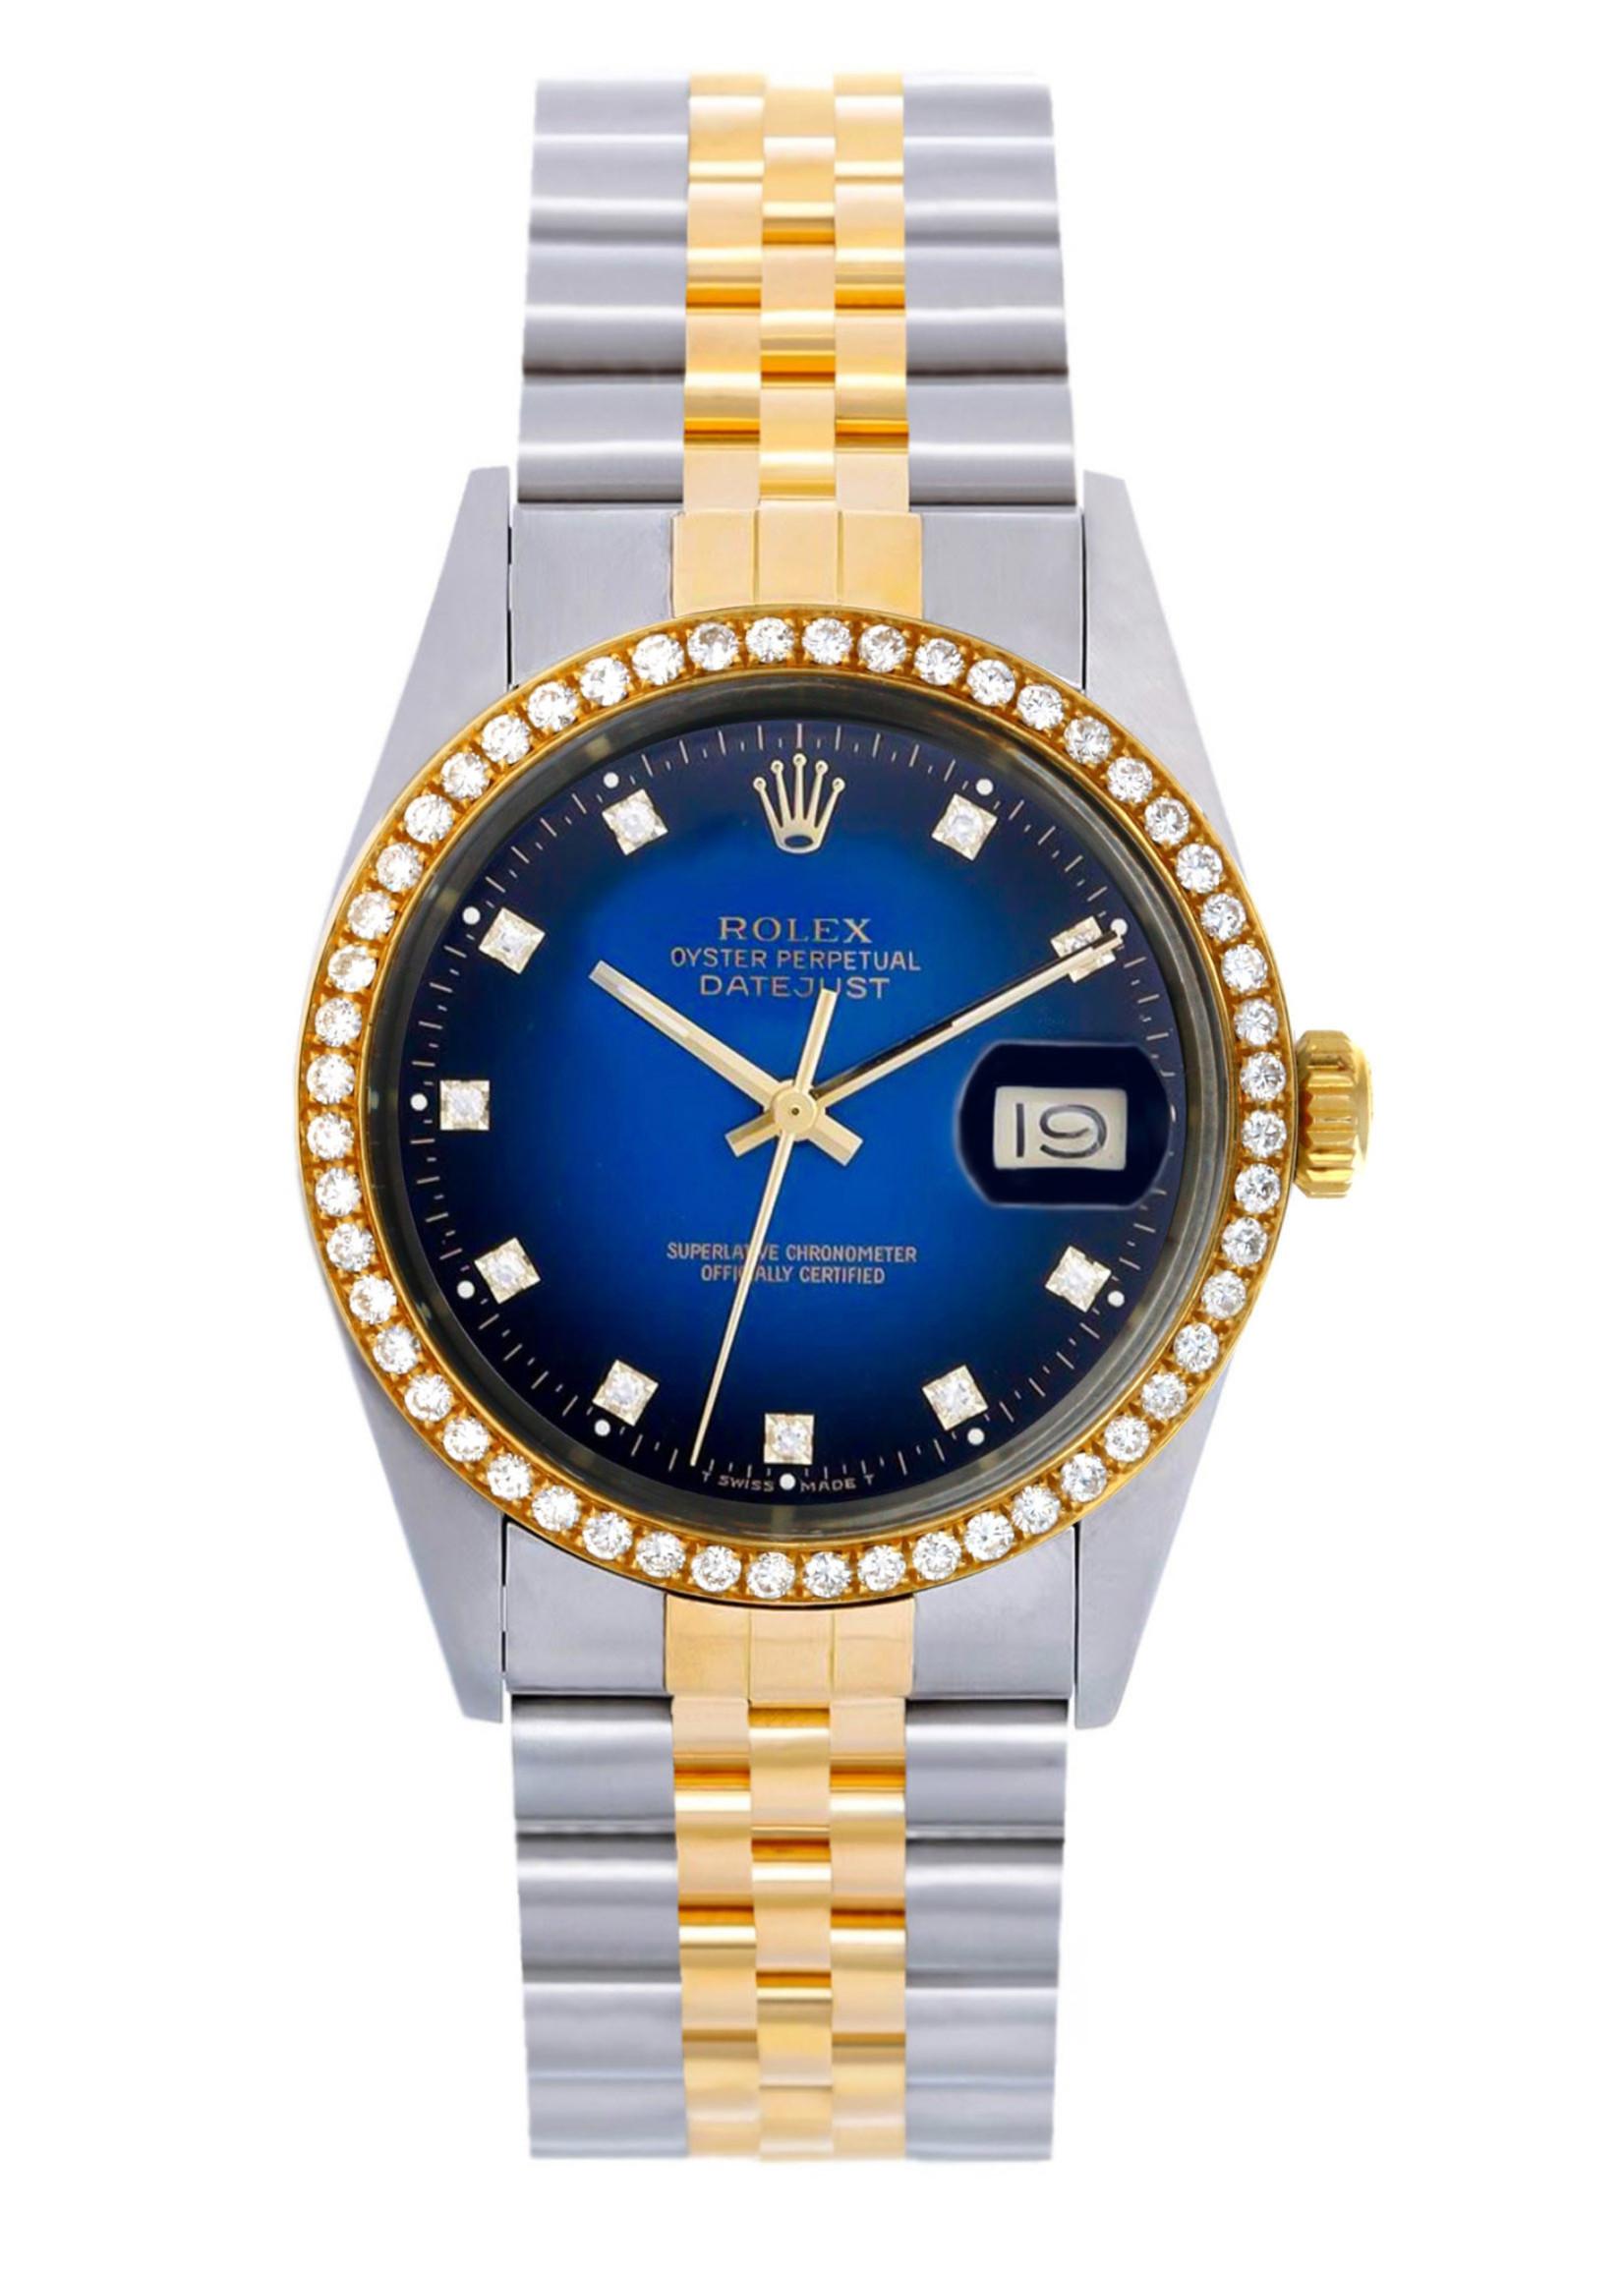 Rolex ROLEX DATEJUST 36MM BLUE DIAMOND DIAL (1984) #126233